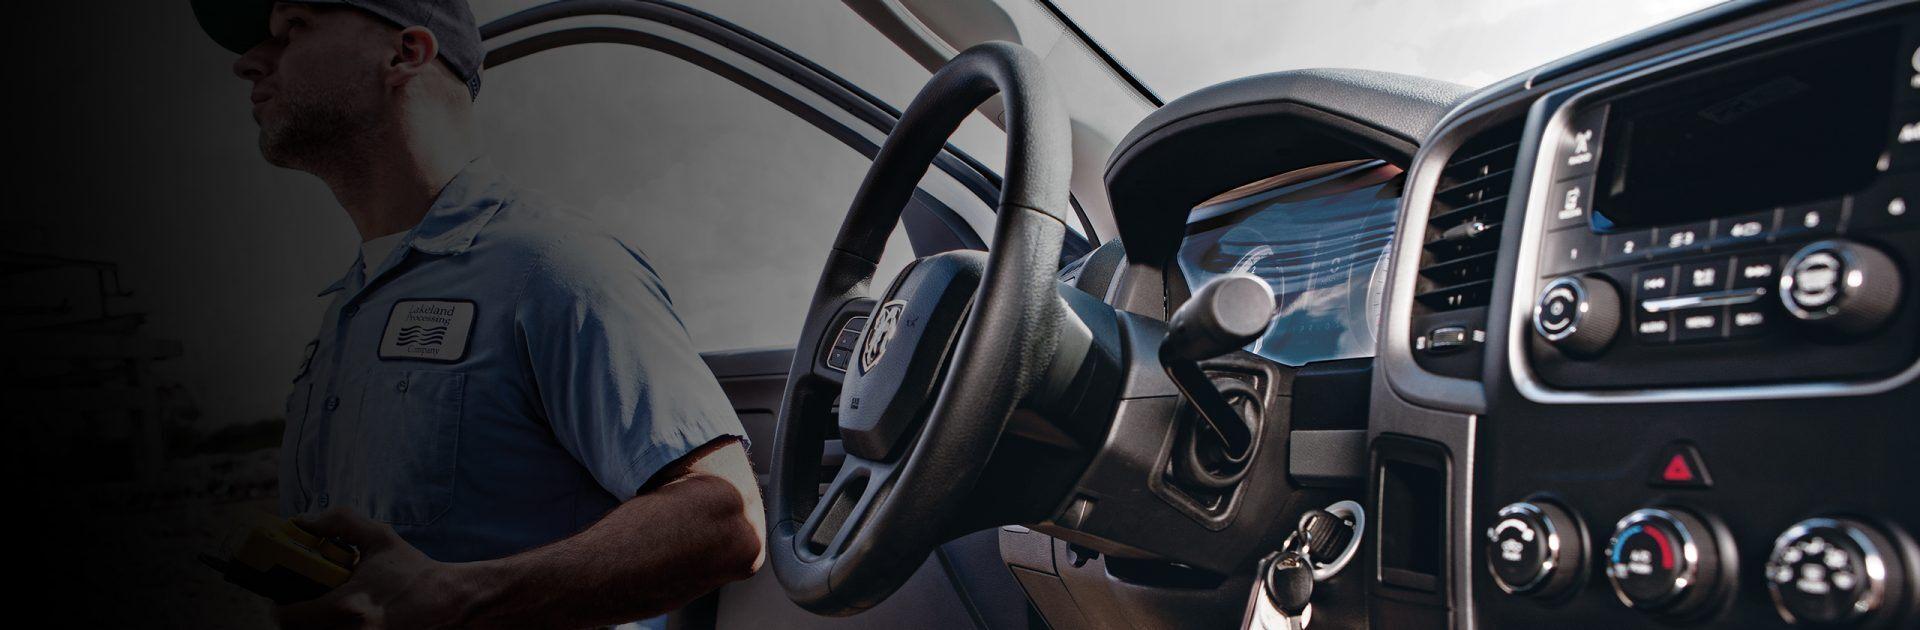 Interior de las camionetas Ram Chassis Cab 2018